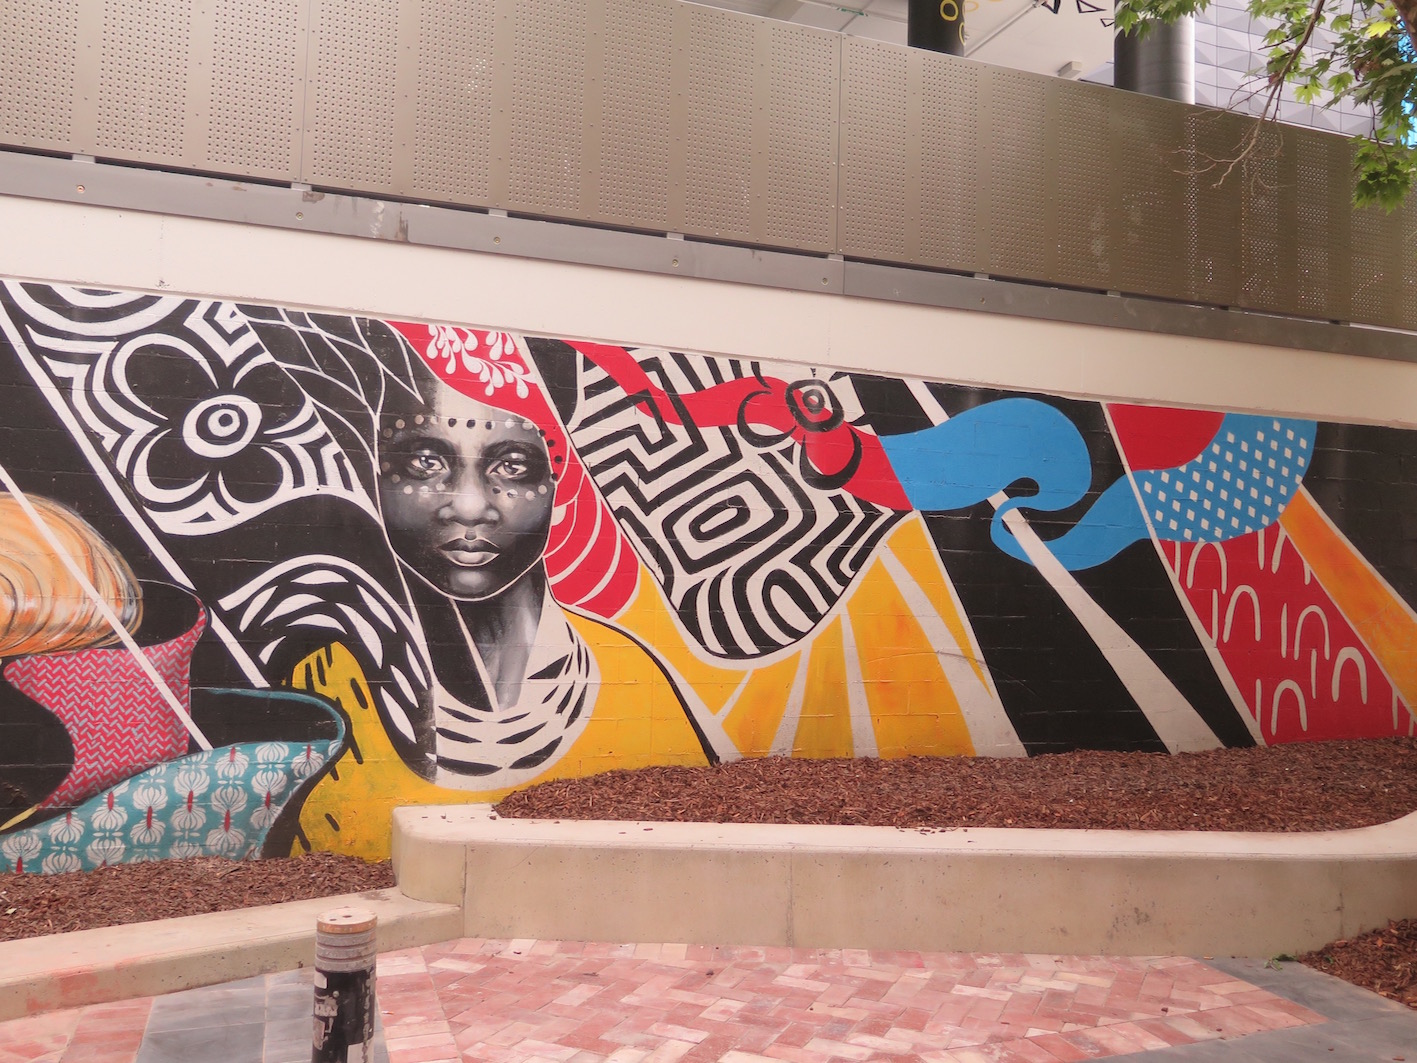 deansunshine_landofsunshine_melbourne_streetart_graffiti_eastland urban art project 8 lucy lucy shannons crees collab 2